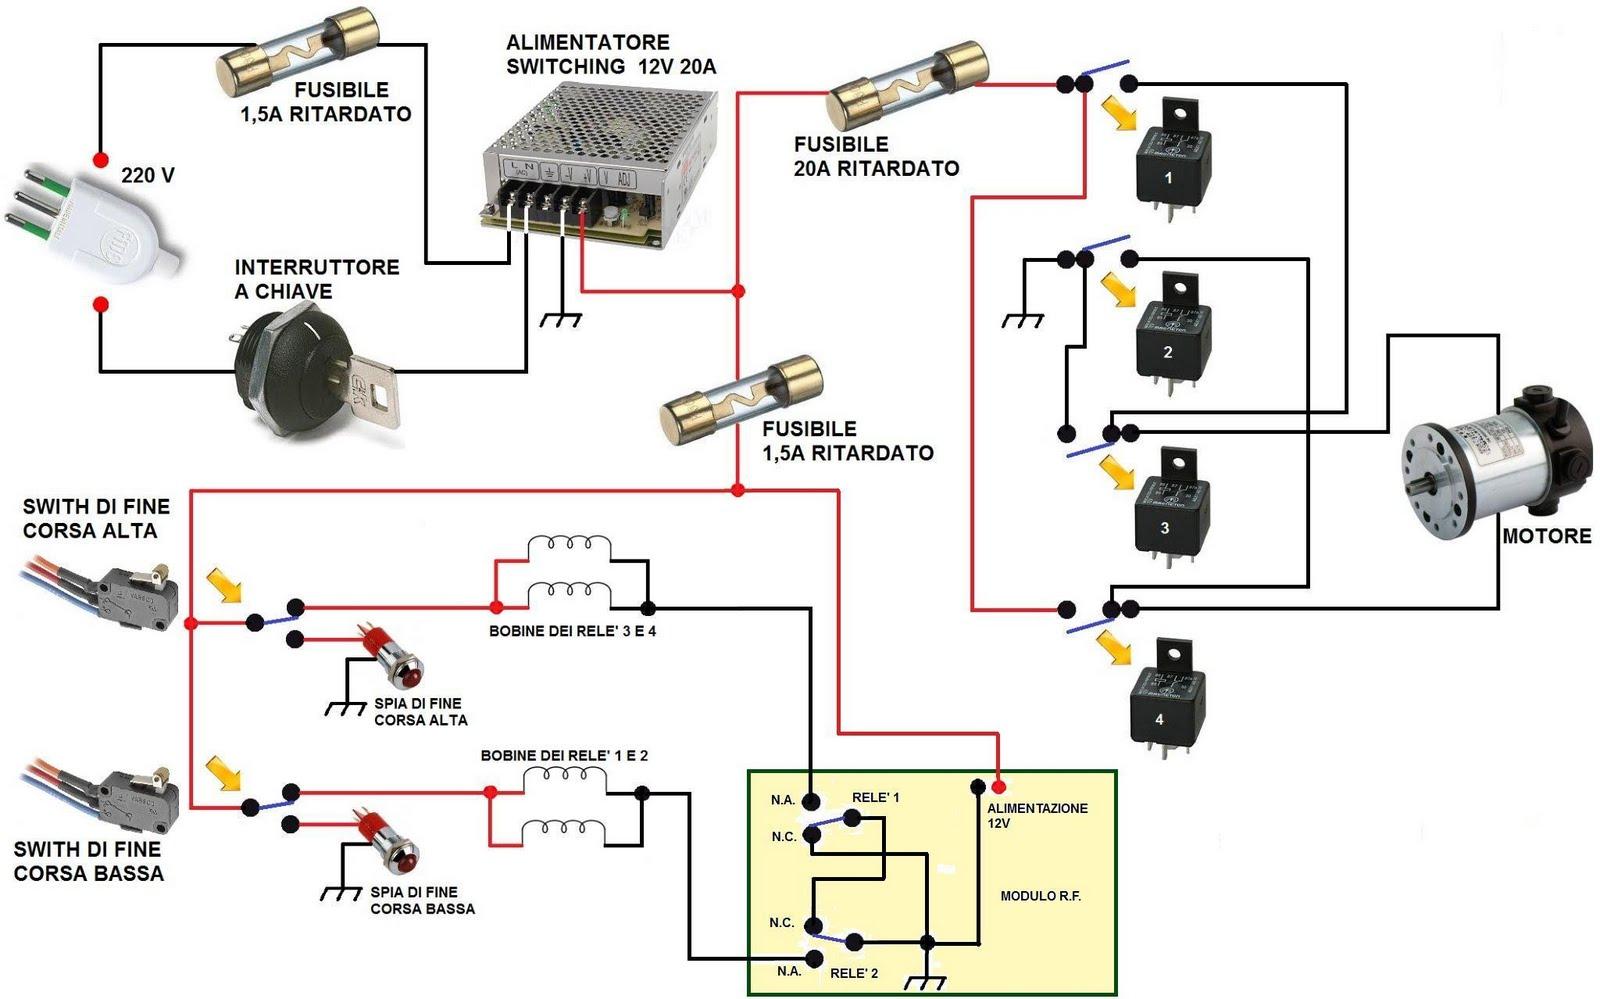 Schema Elettrico Ecu : Schemi elettrici per plastici ferroviari sistema di